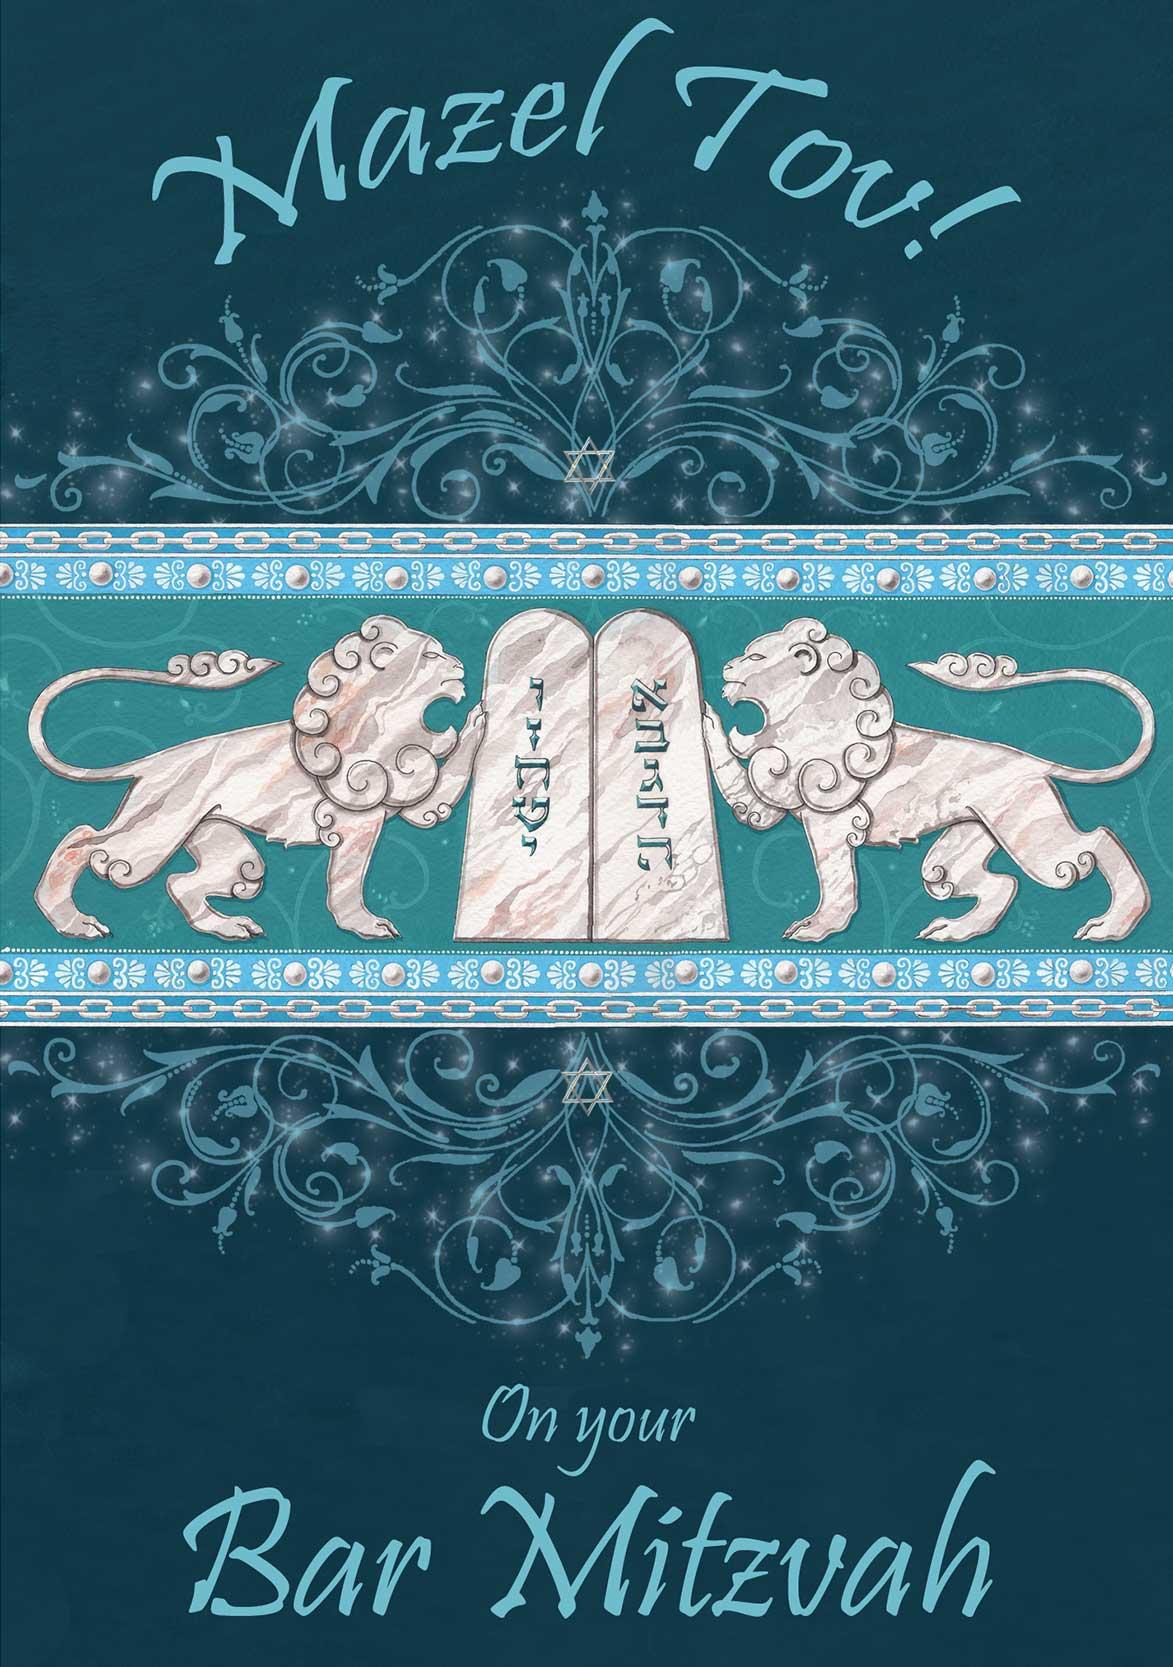 BR621 Lions of Judah Bar Mitzvah Greeting Card by Mickie Caspi